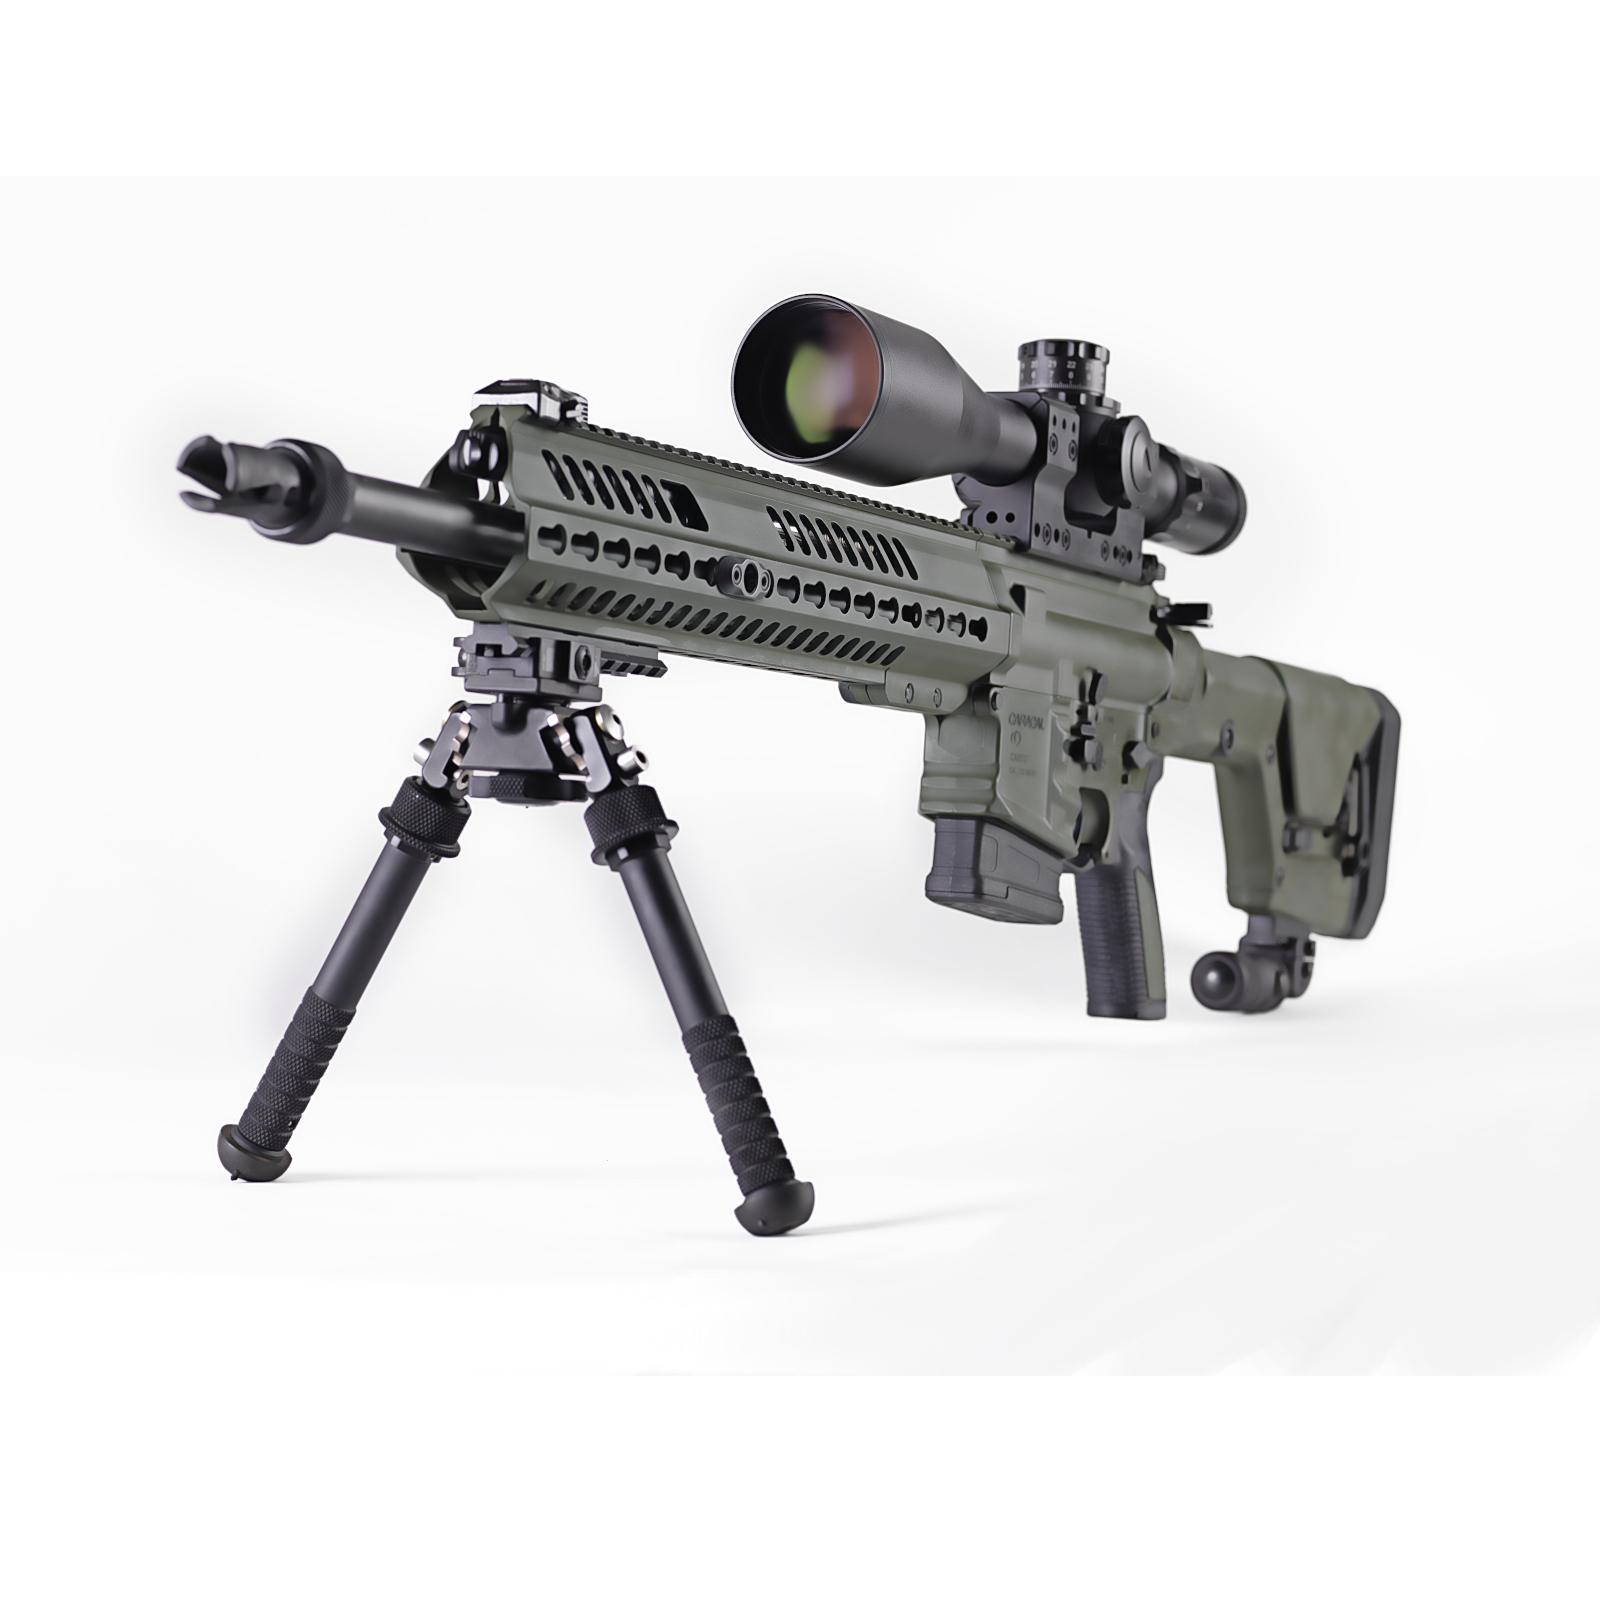 Sniper CAR 817 DMR green